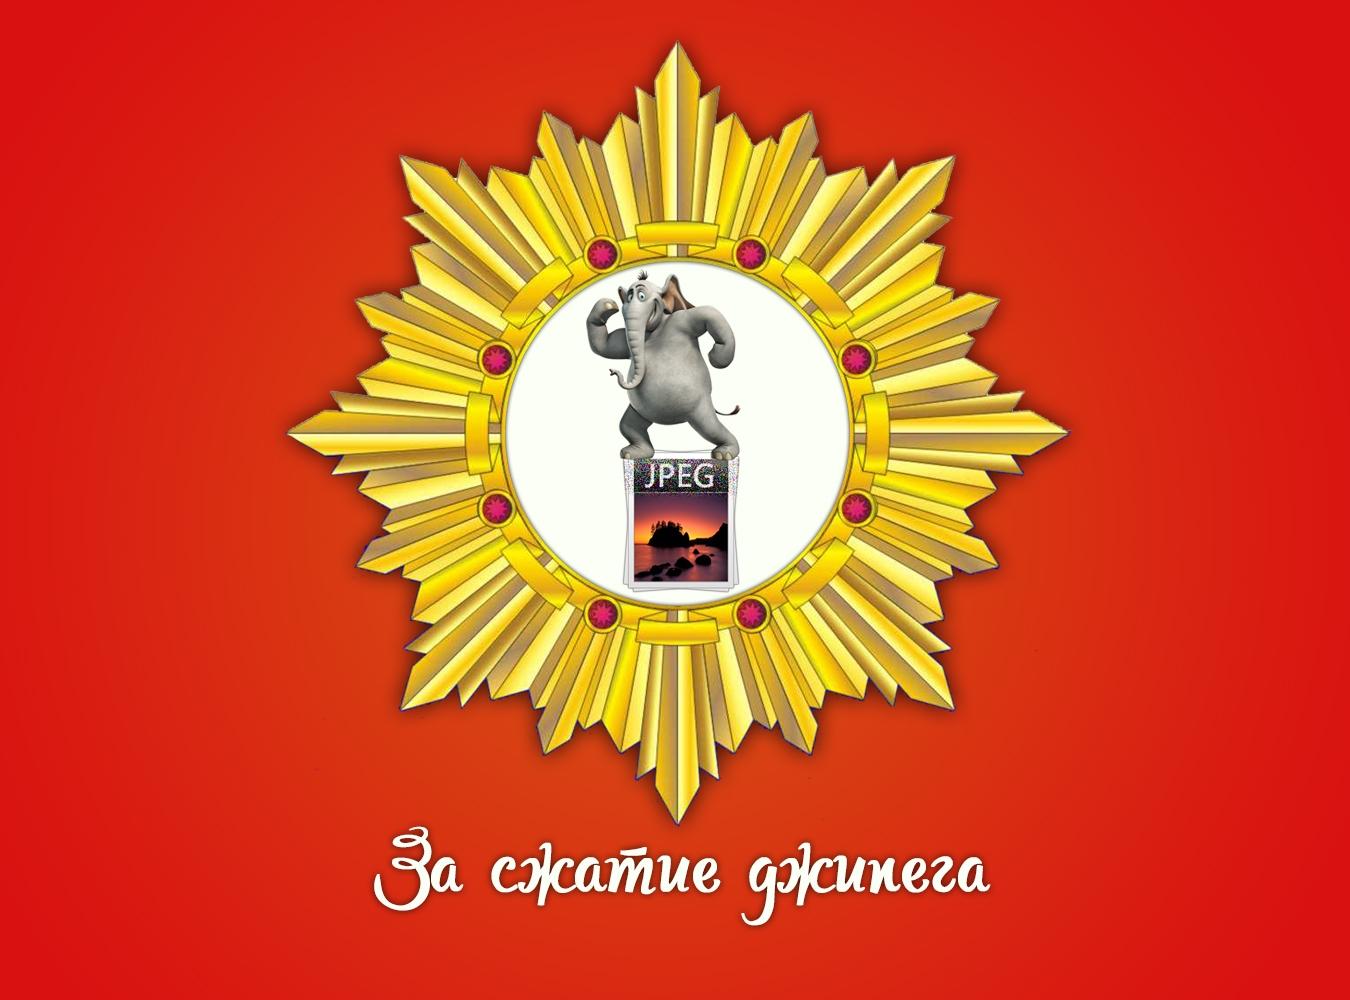 Орден за сжатие JPEG Креатив Блог Антона Лосева